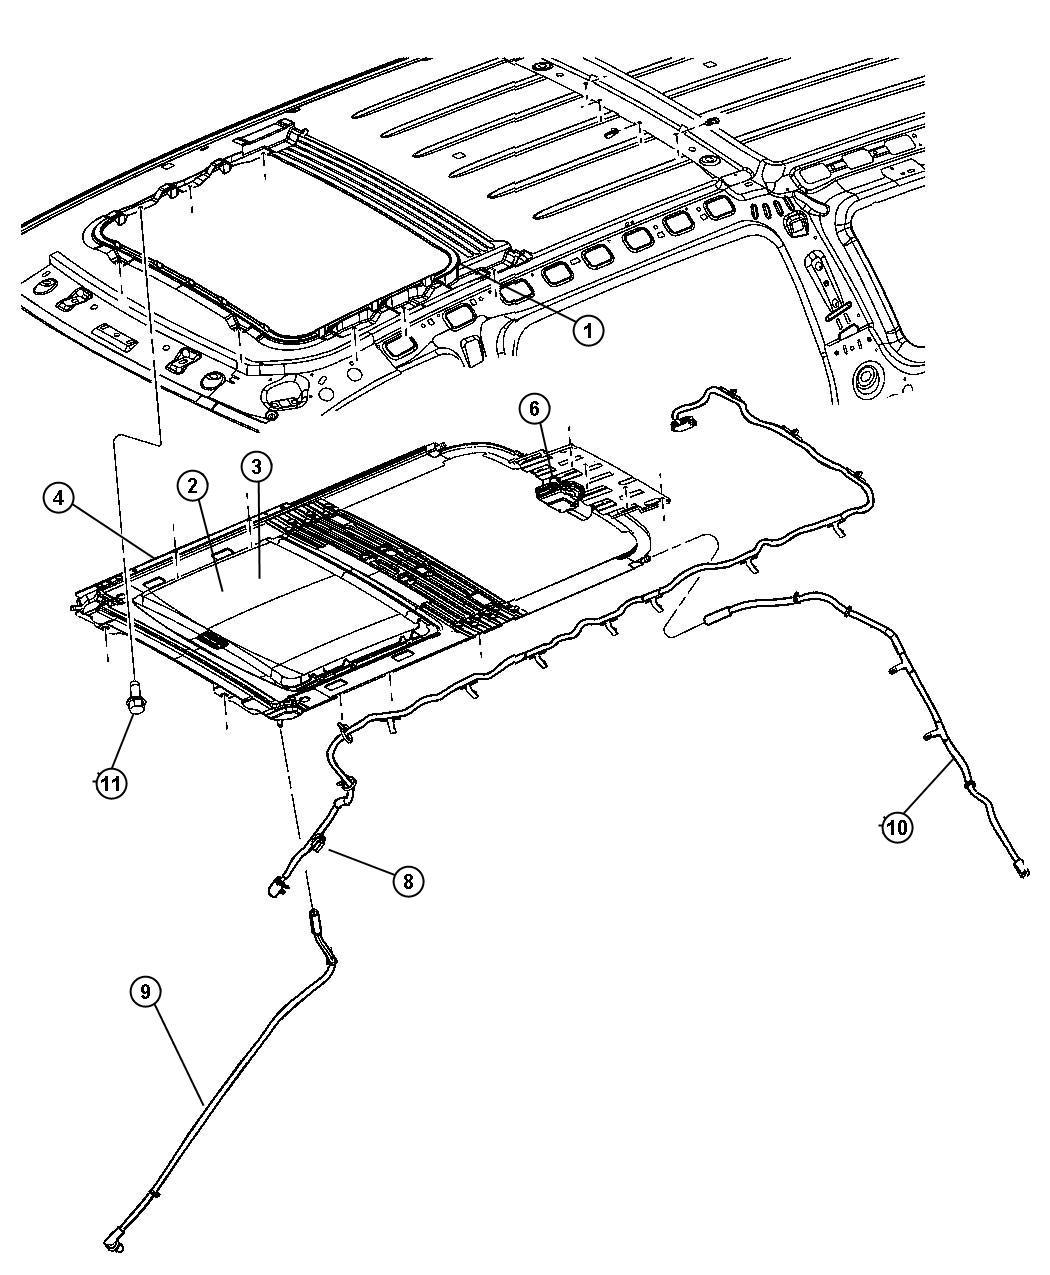 2004 dodge durango roof parts diagram  dodge  auto wiring